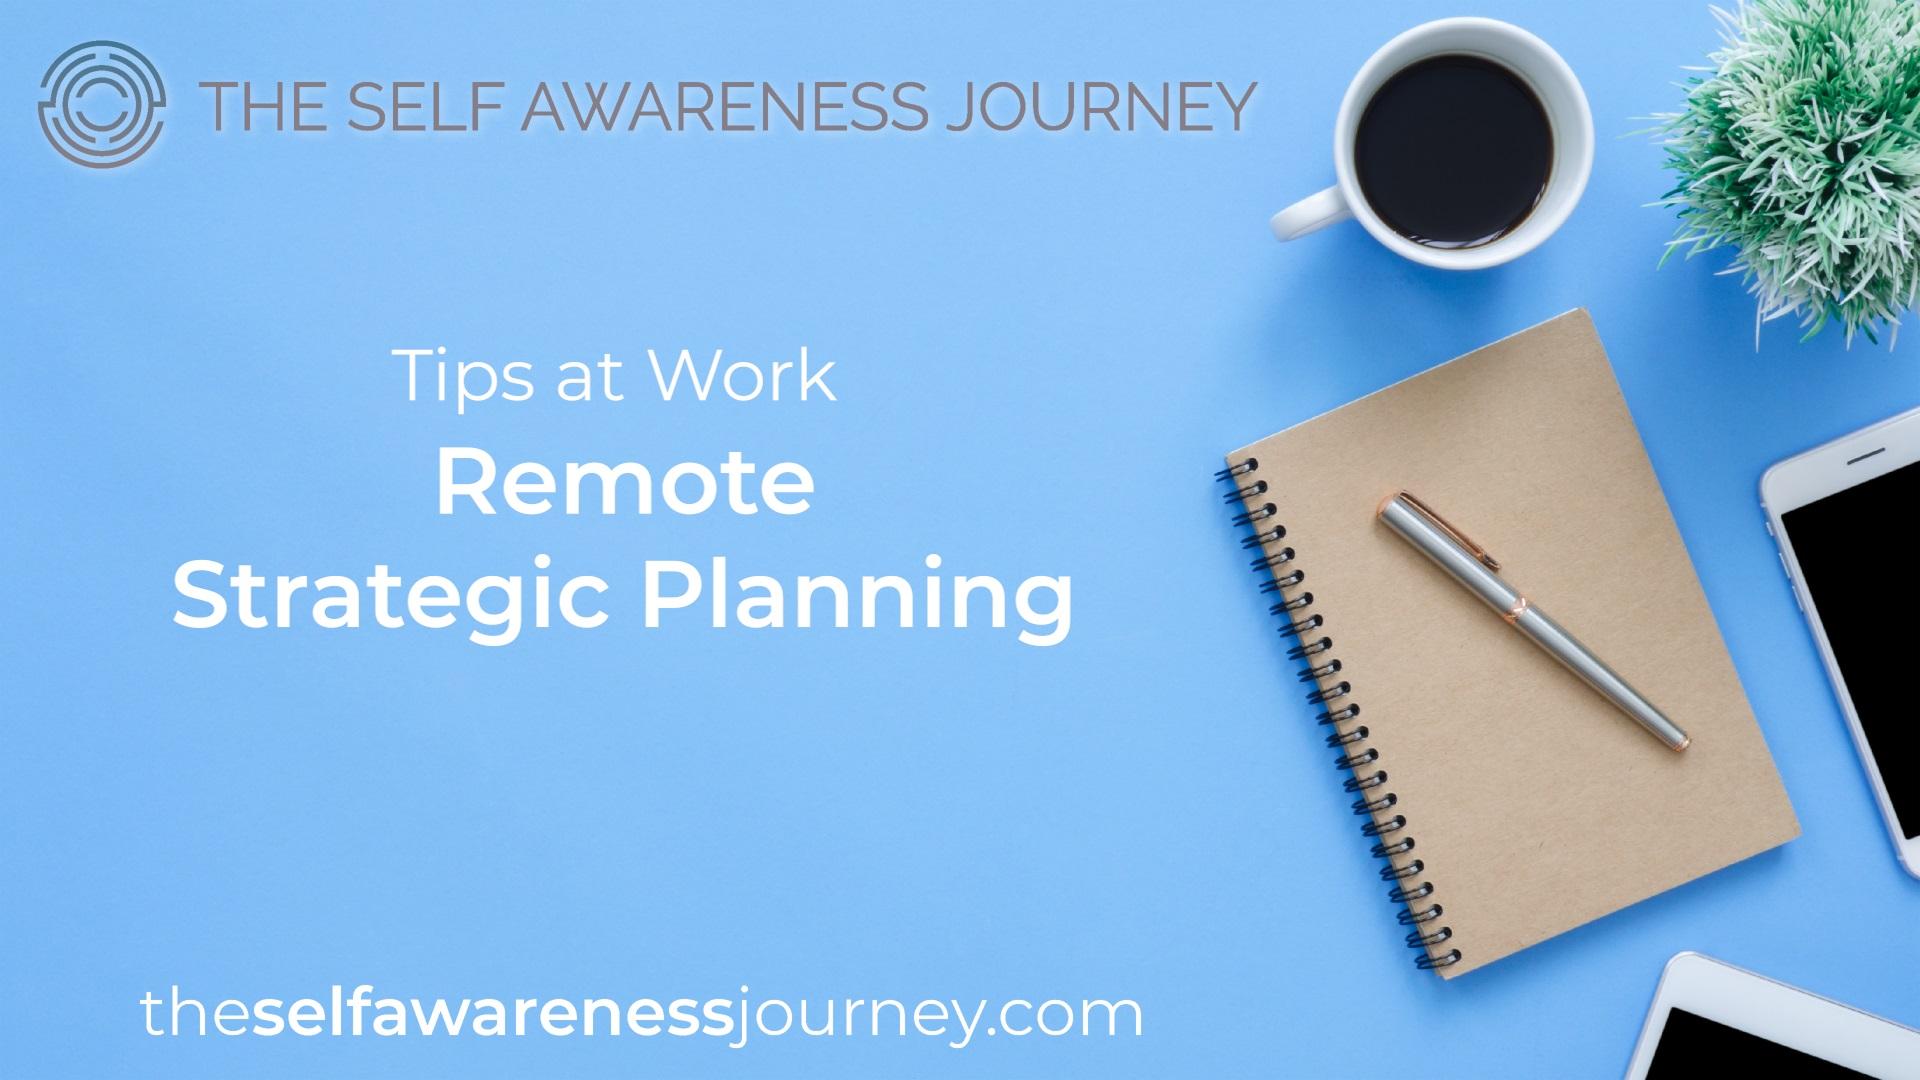 For Remote Strategic Planning